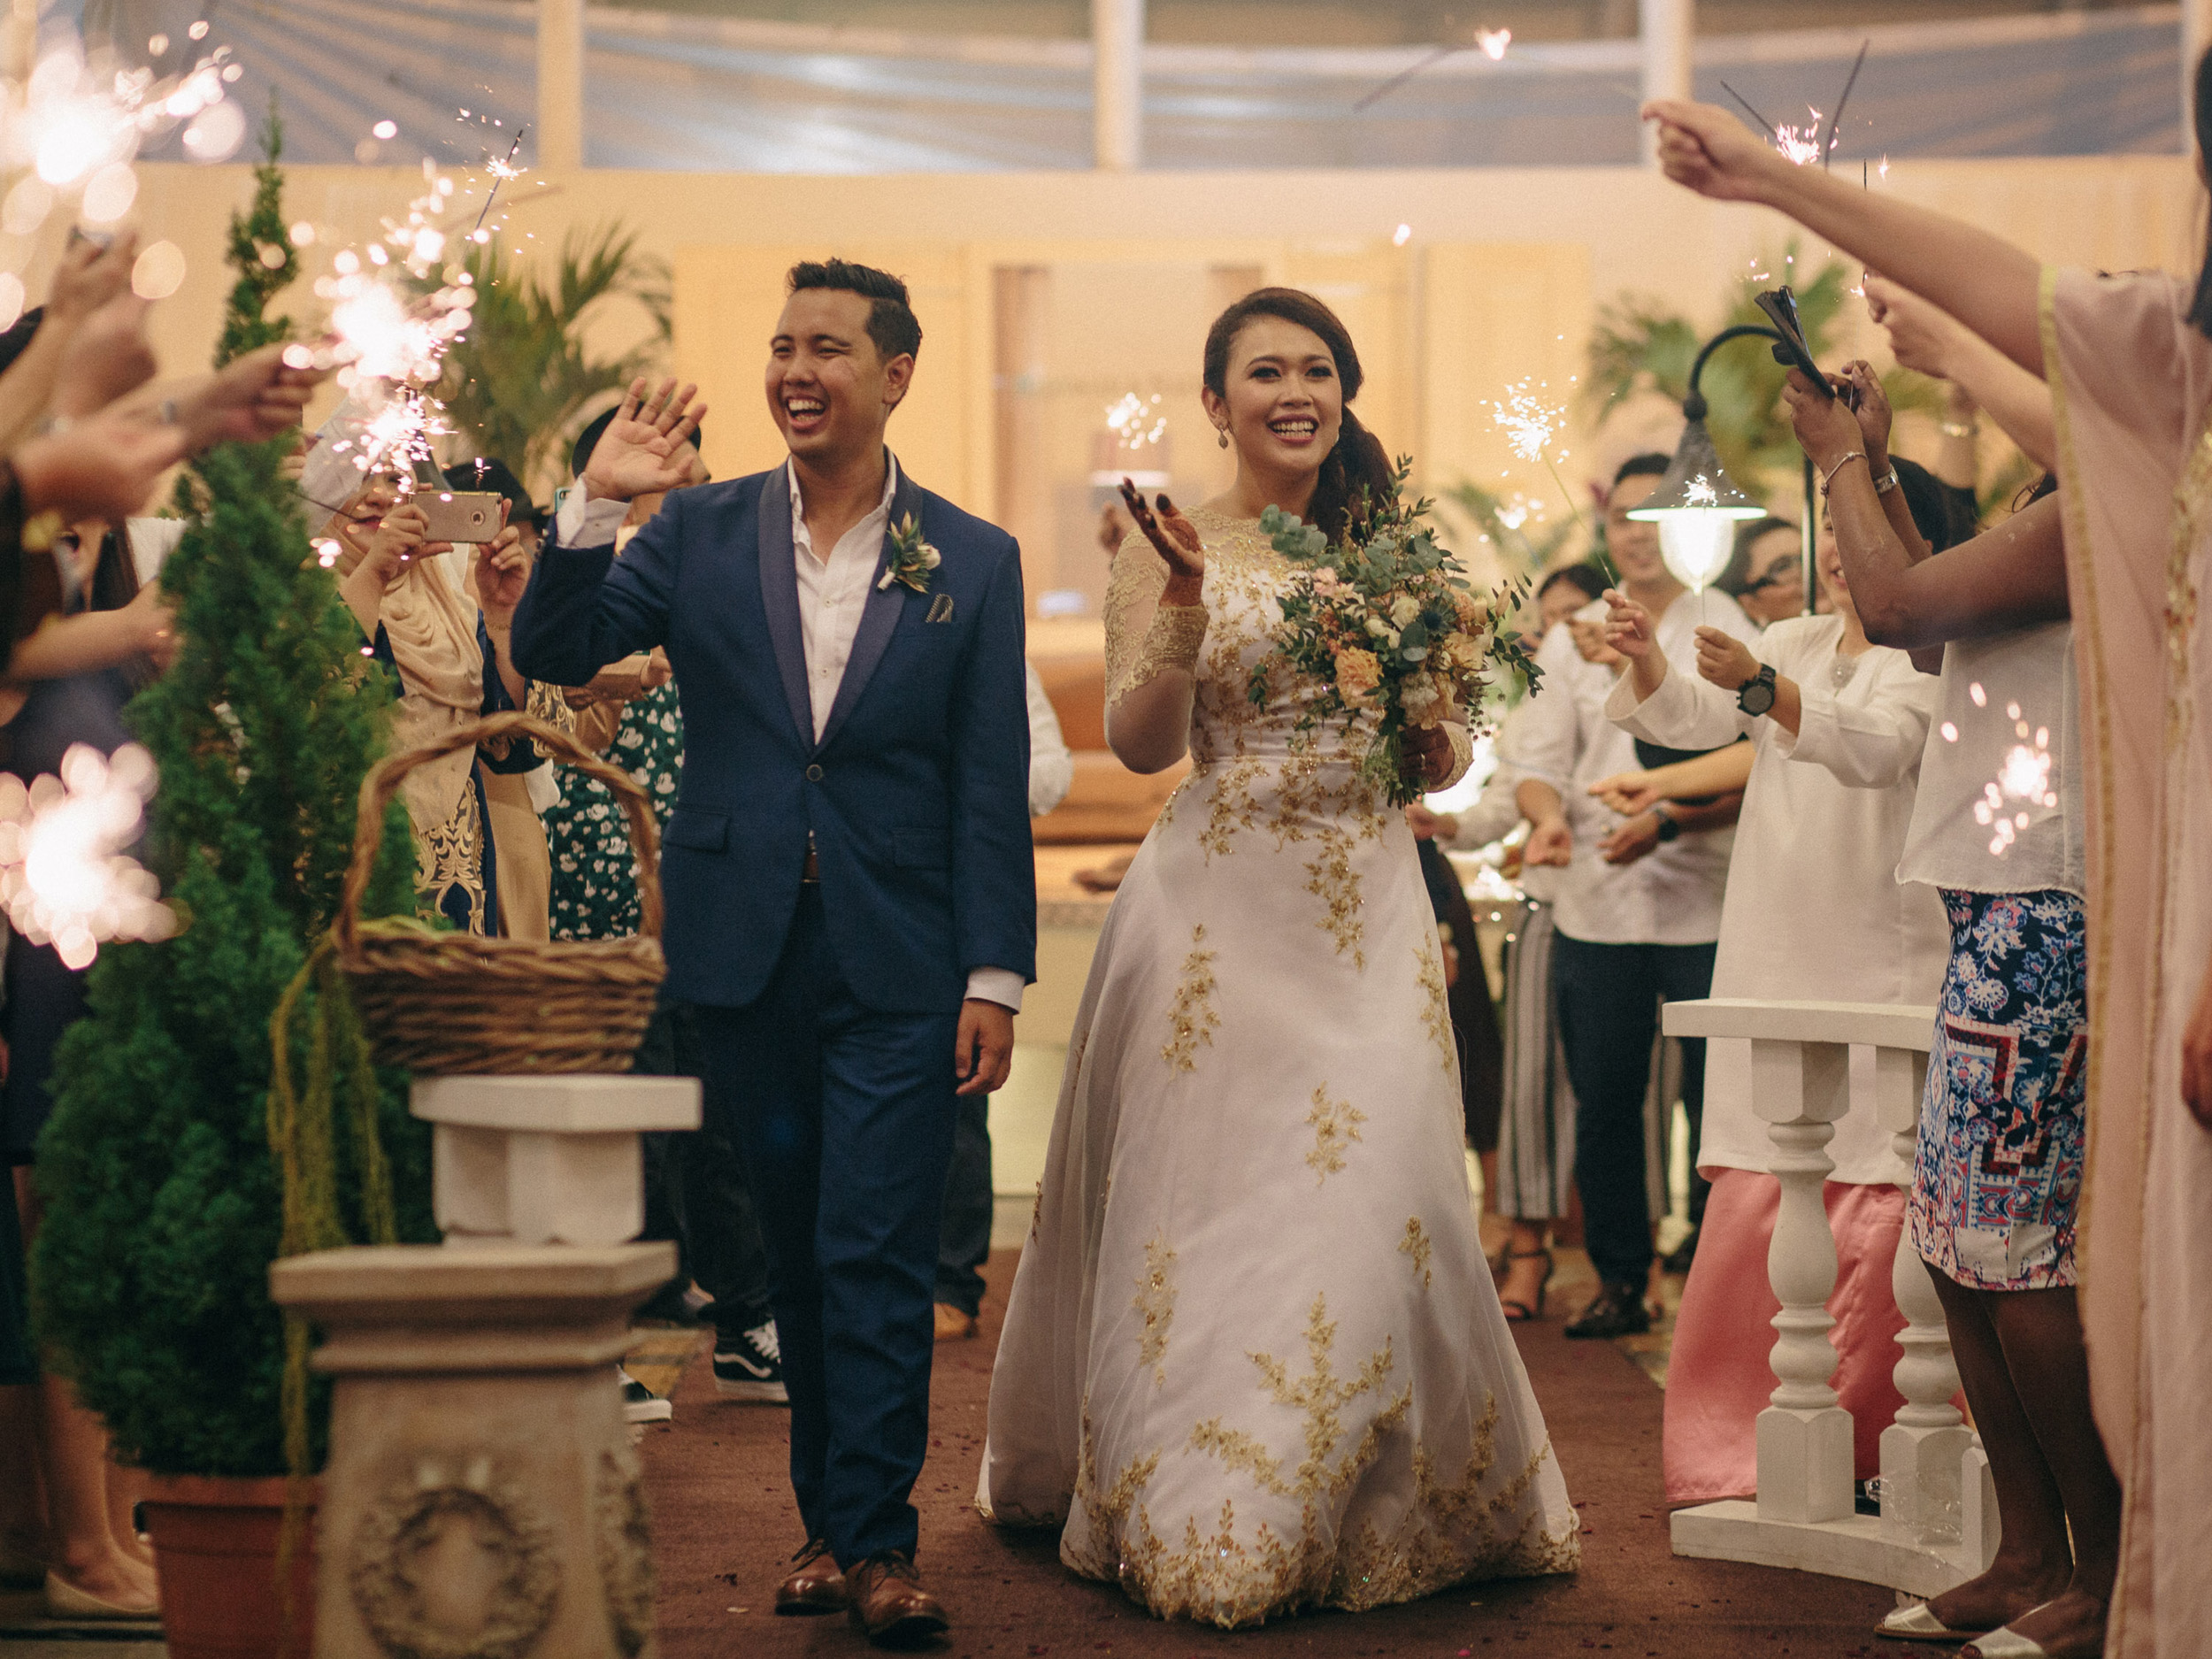 singapore-wedding-photographer-photography-wmt2017-018.jpg